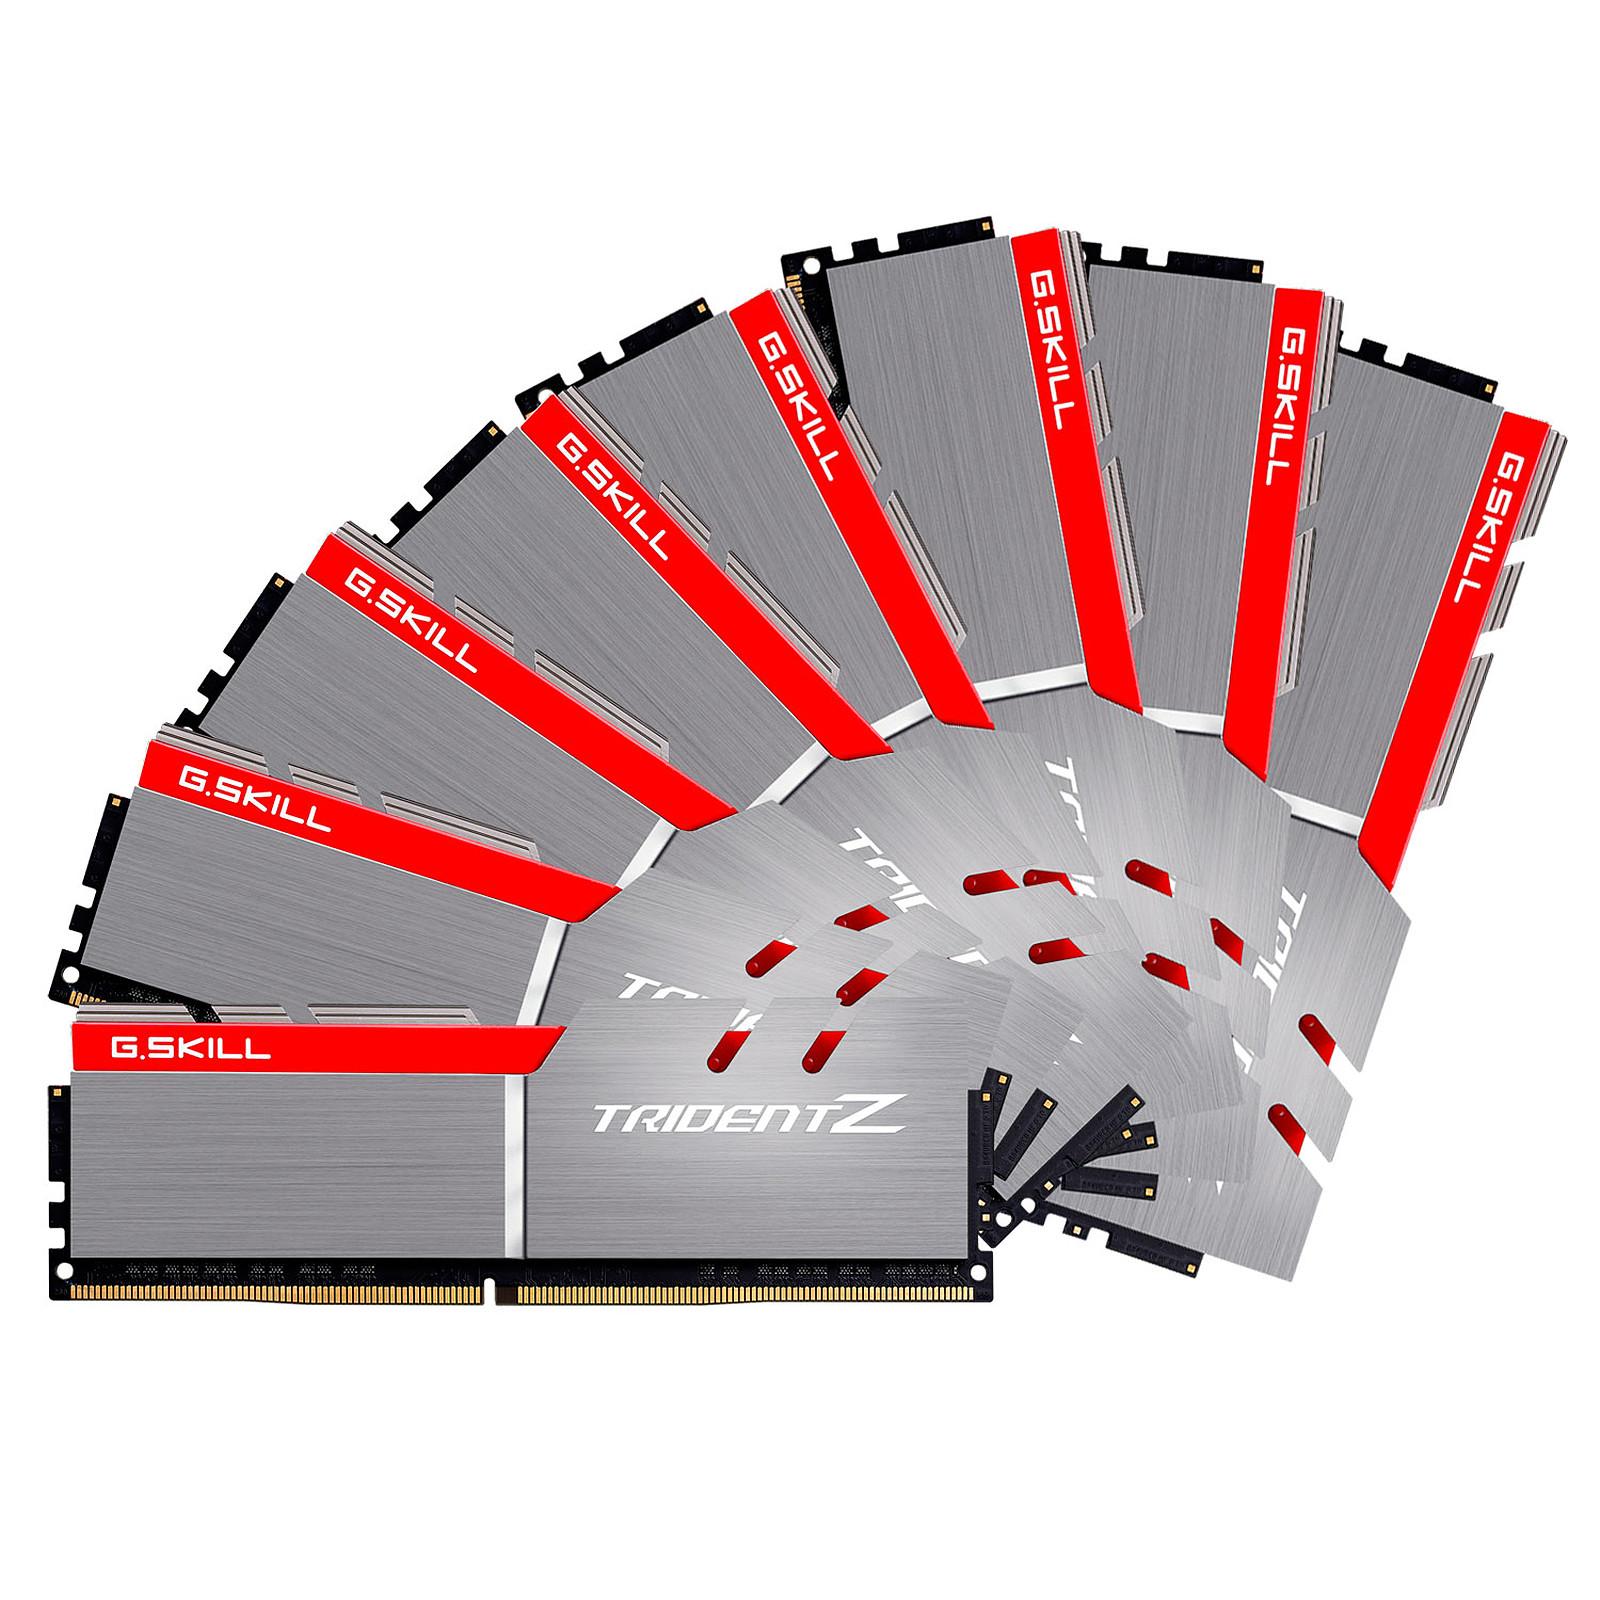 G.Skill Trident Z 64 Go (8x 8 Go) DDR4 3200 MHz CL15